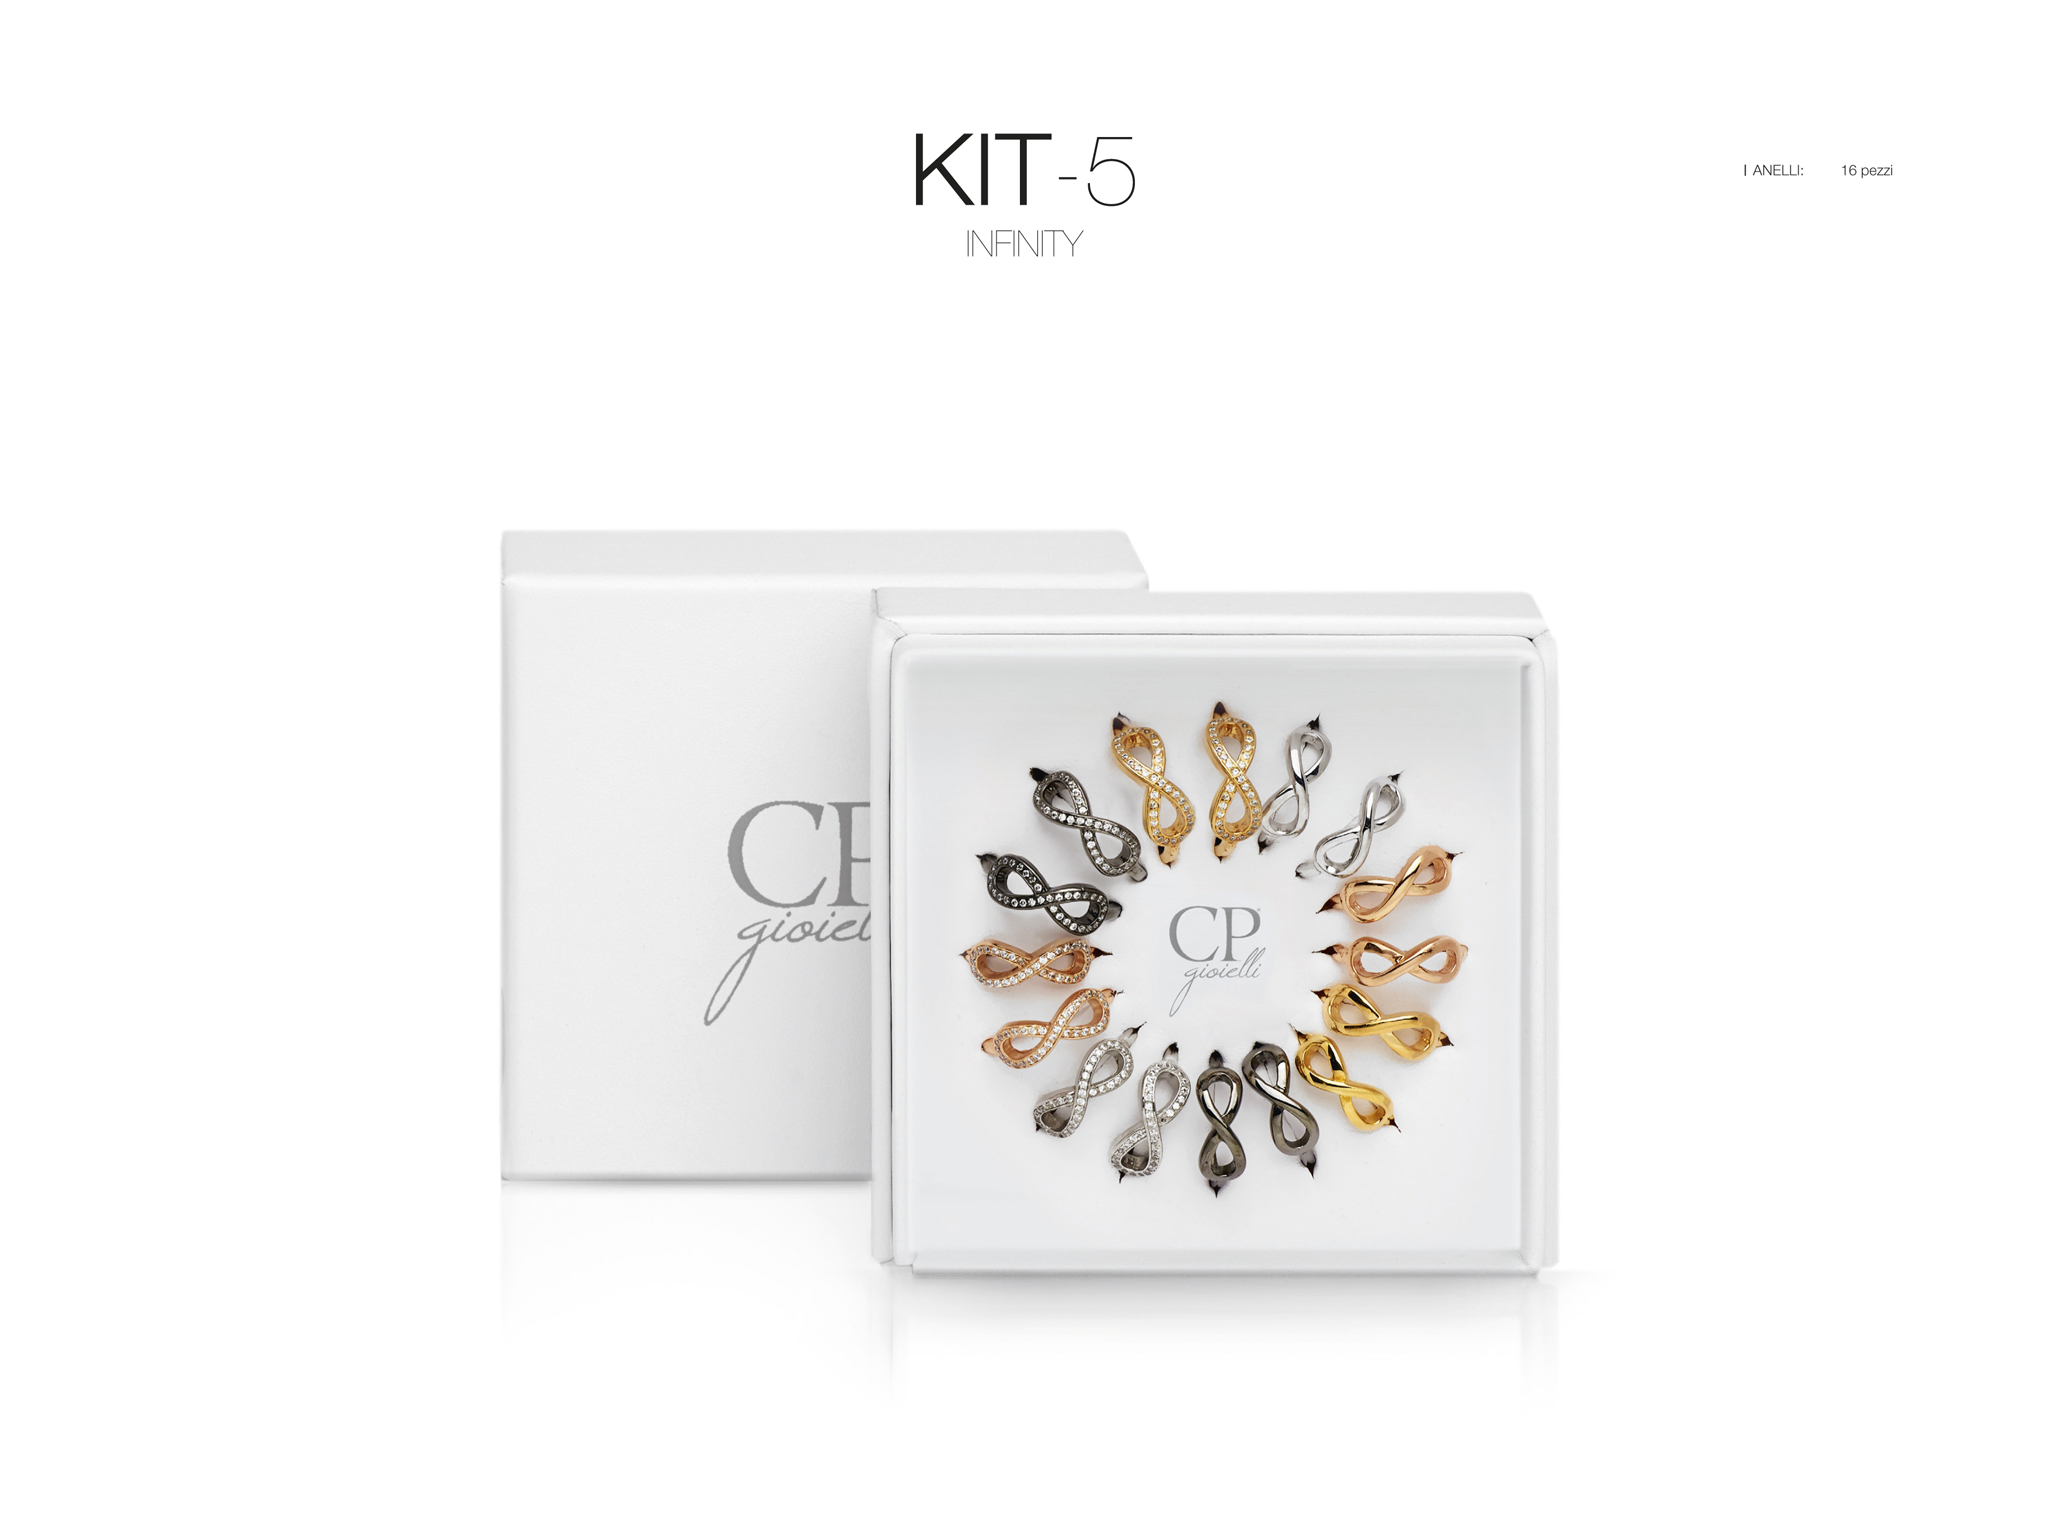 kit_argento_3.0_2016_pagina_22_APP